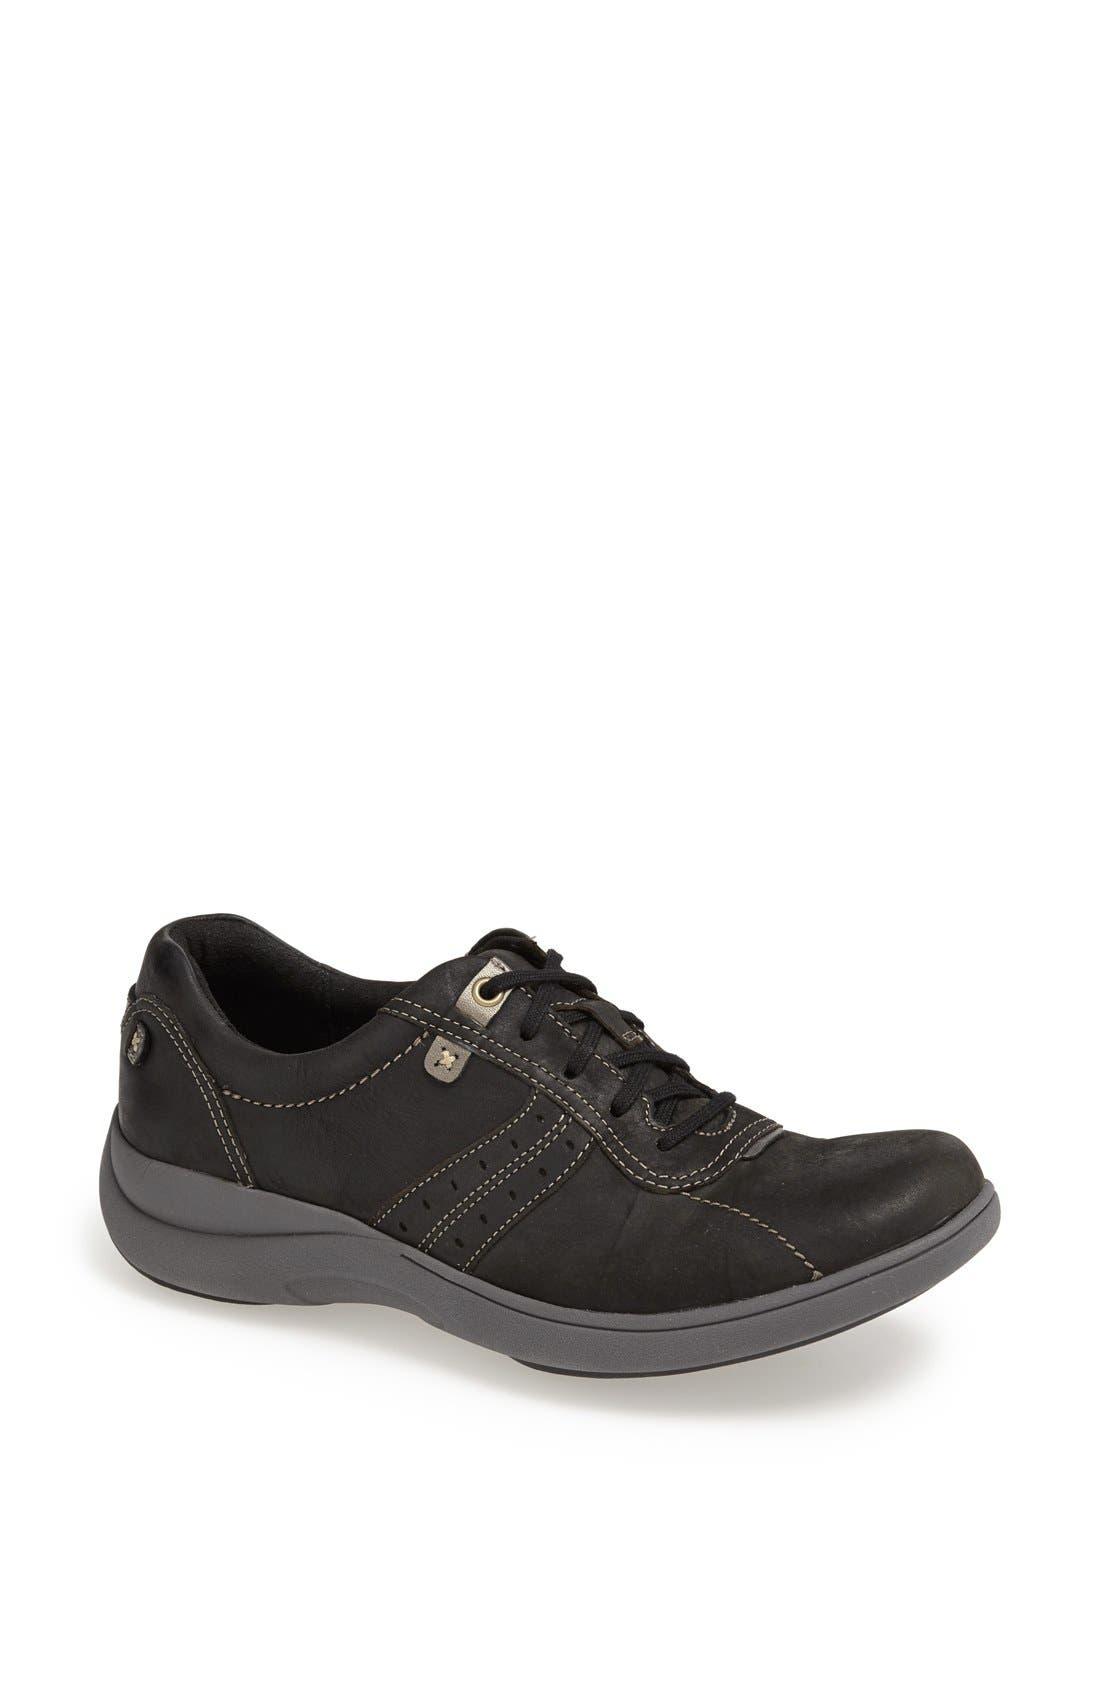 Main Image - Aravon 'REVsmart' Sneaker (Women)